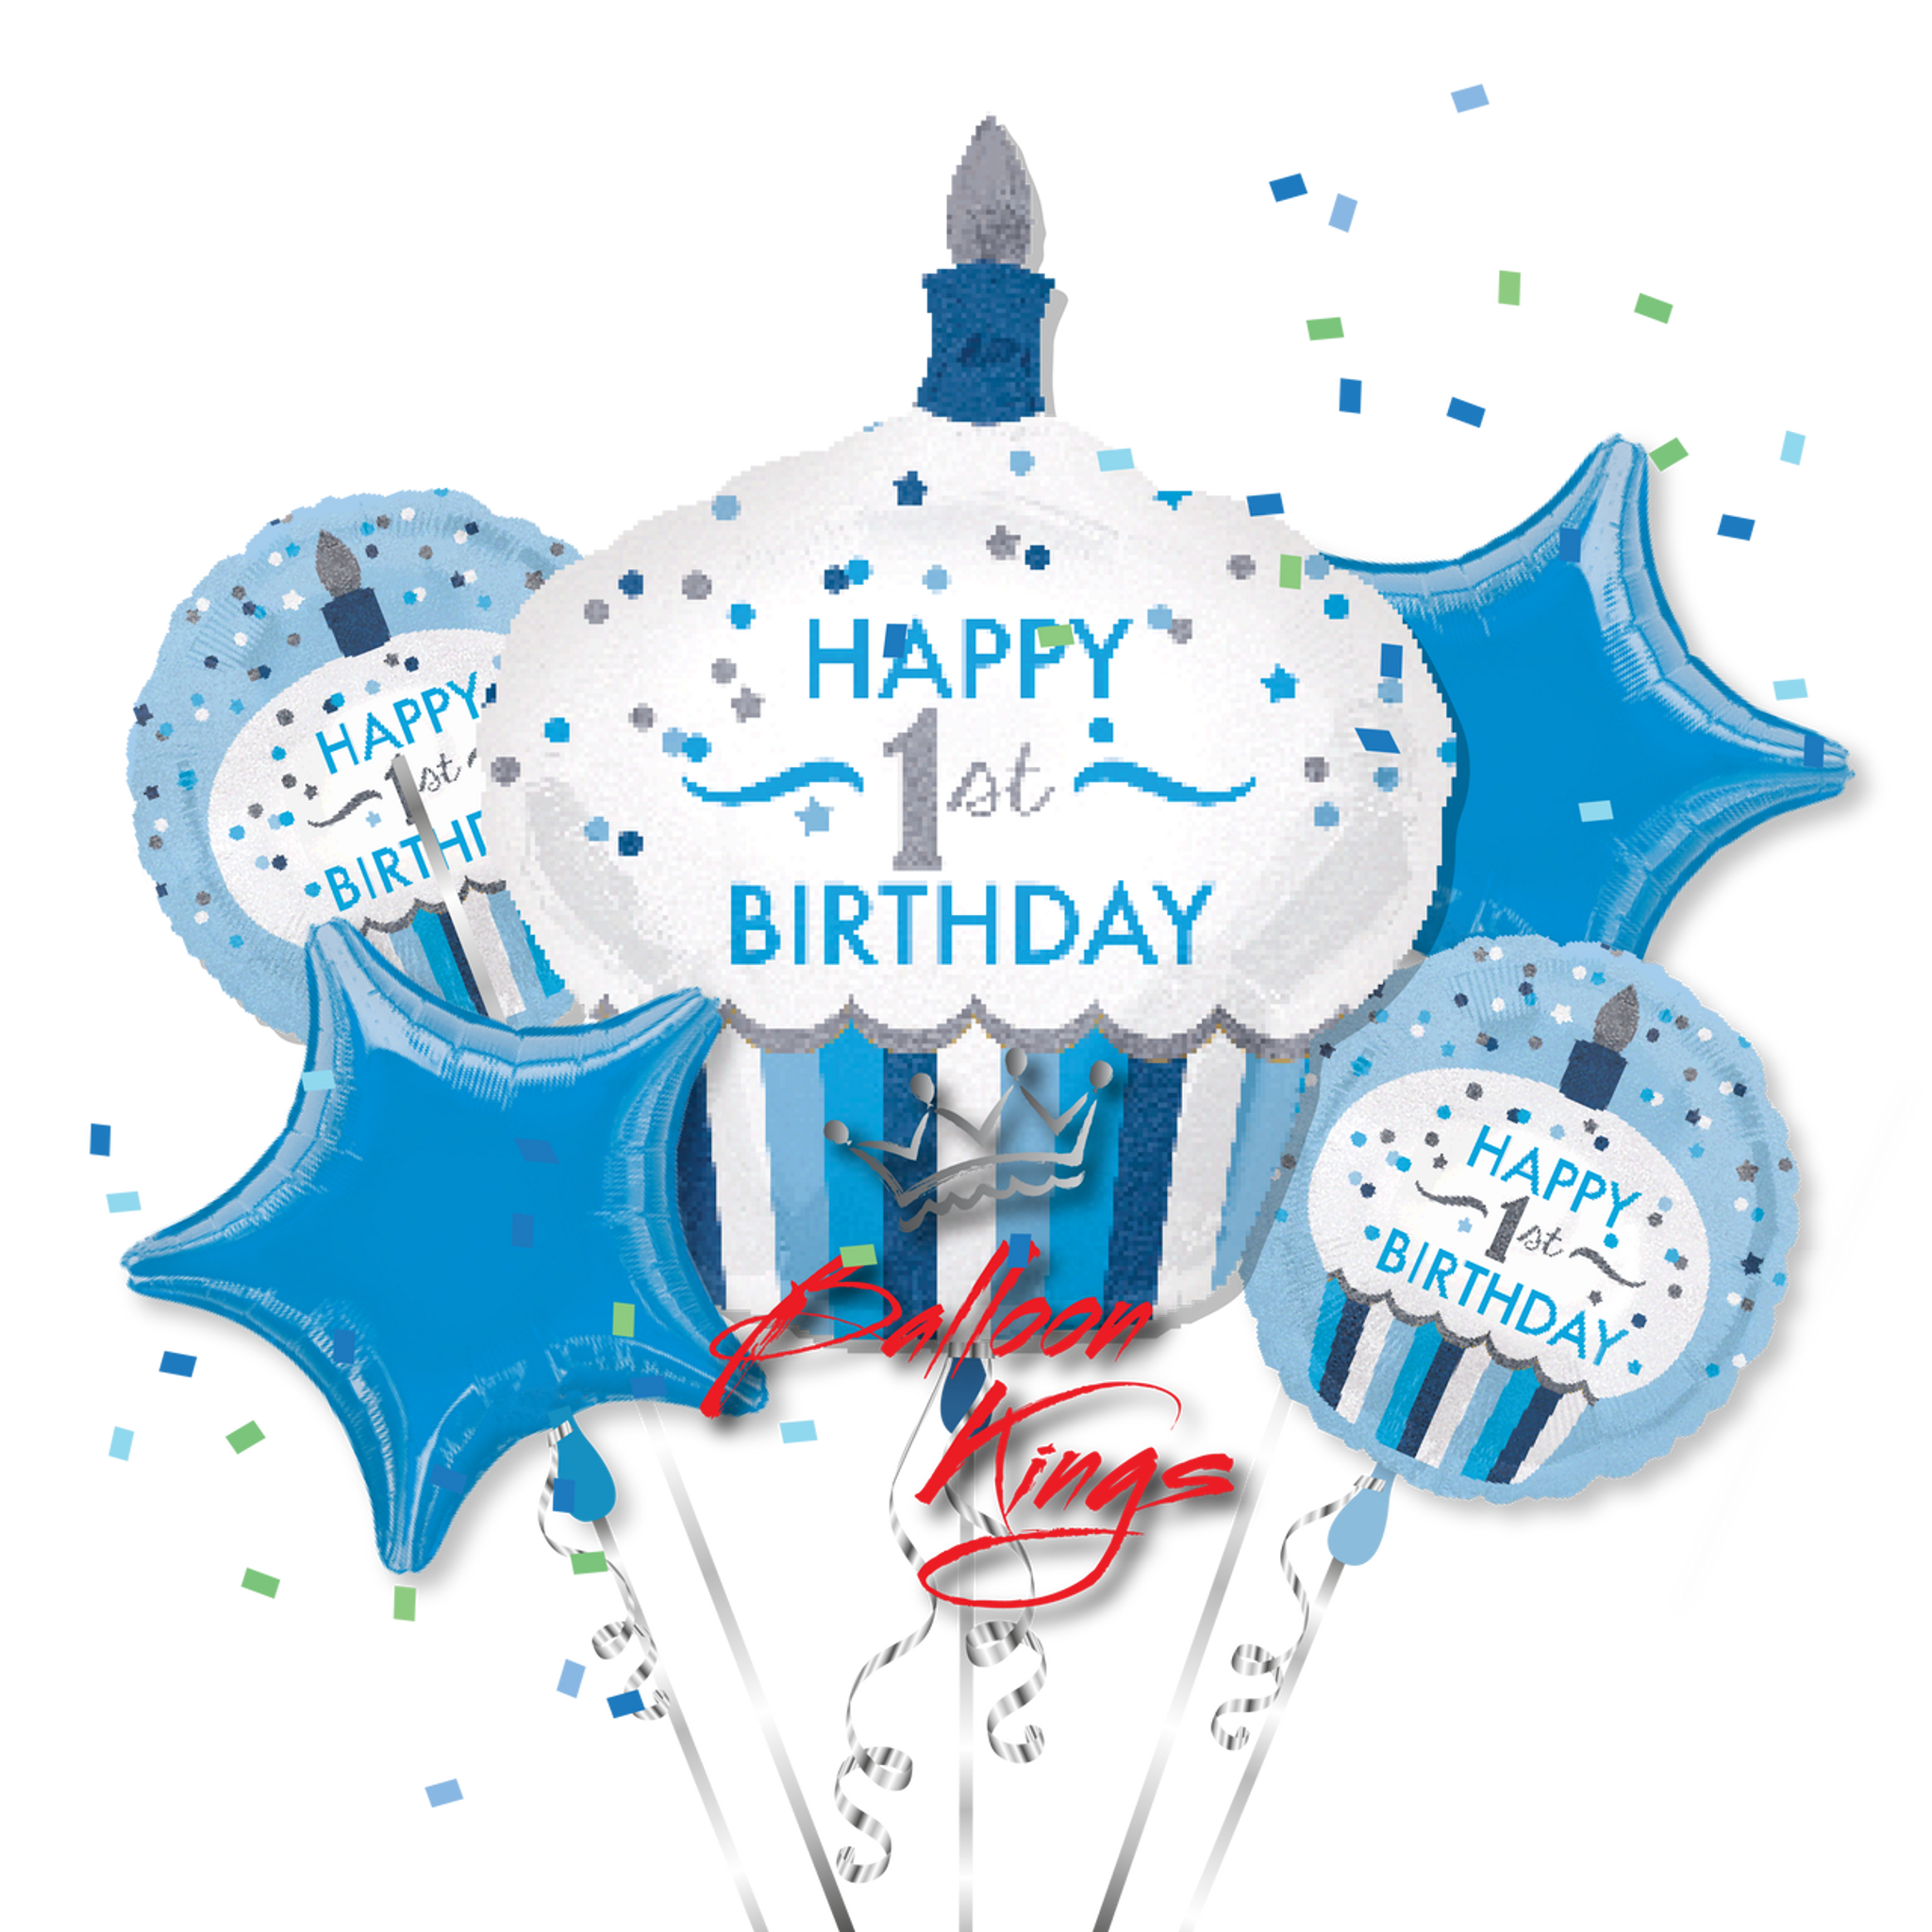 1st Birthday Boy Cupcake Bouquet   Balloon Kings